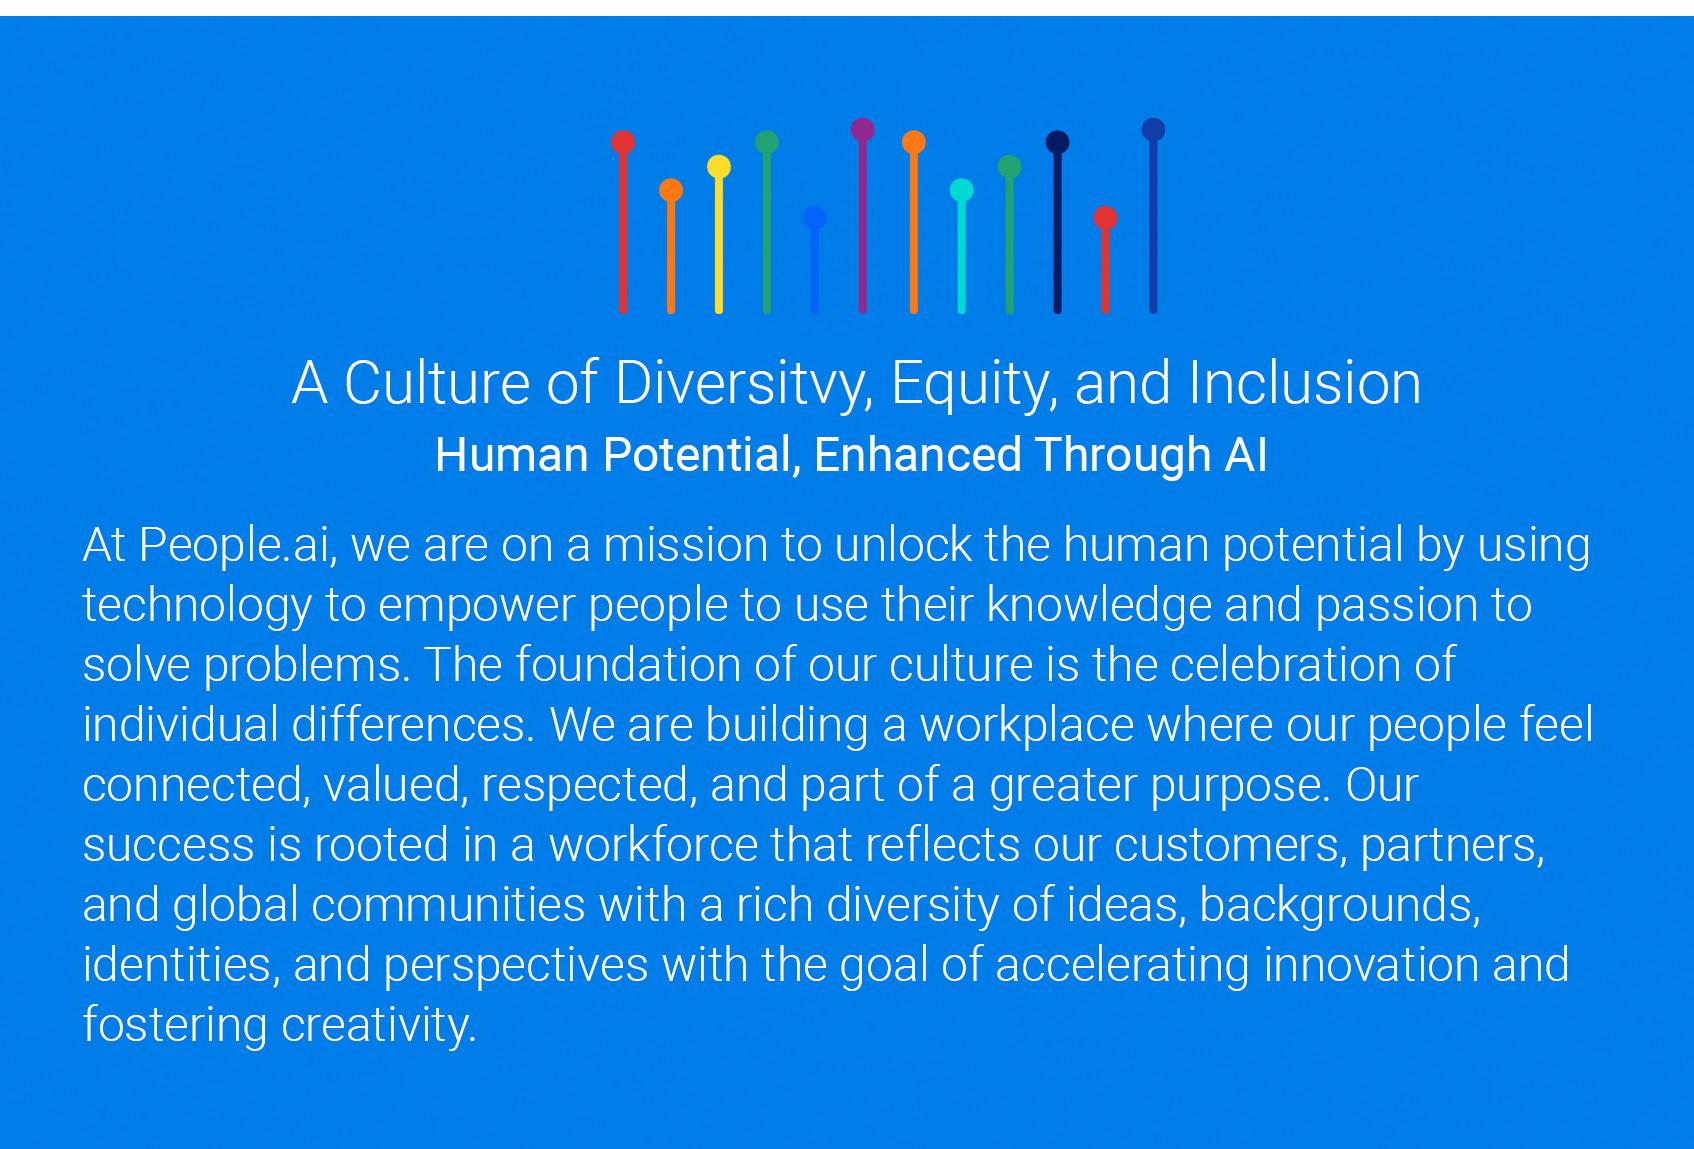 People.ai Diversity